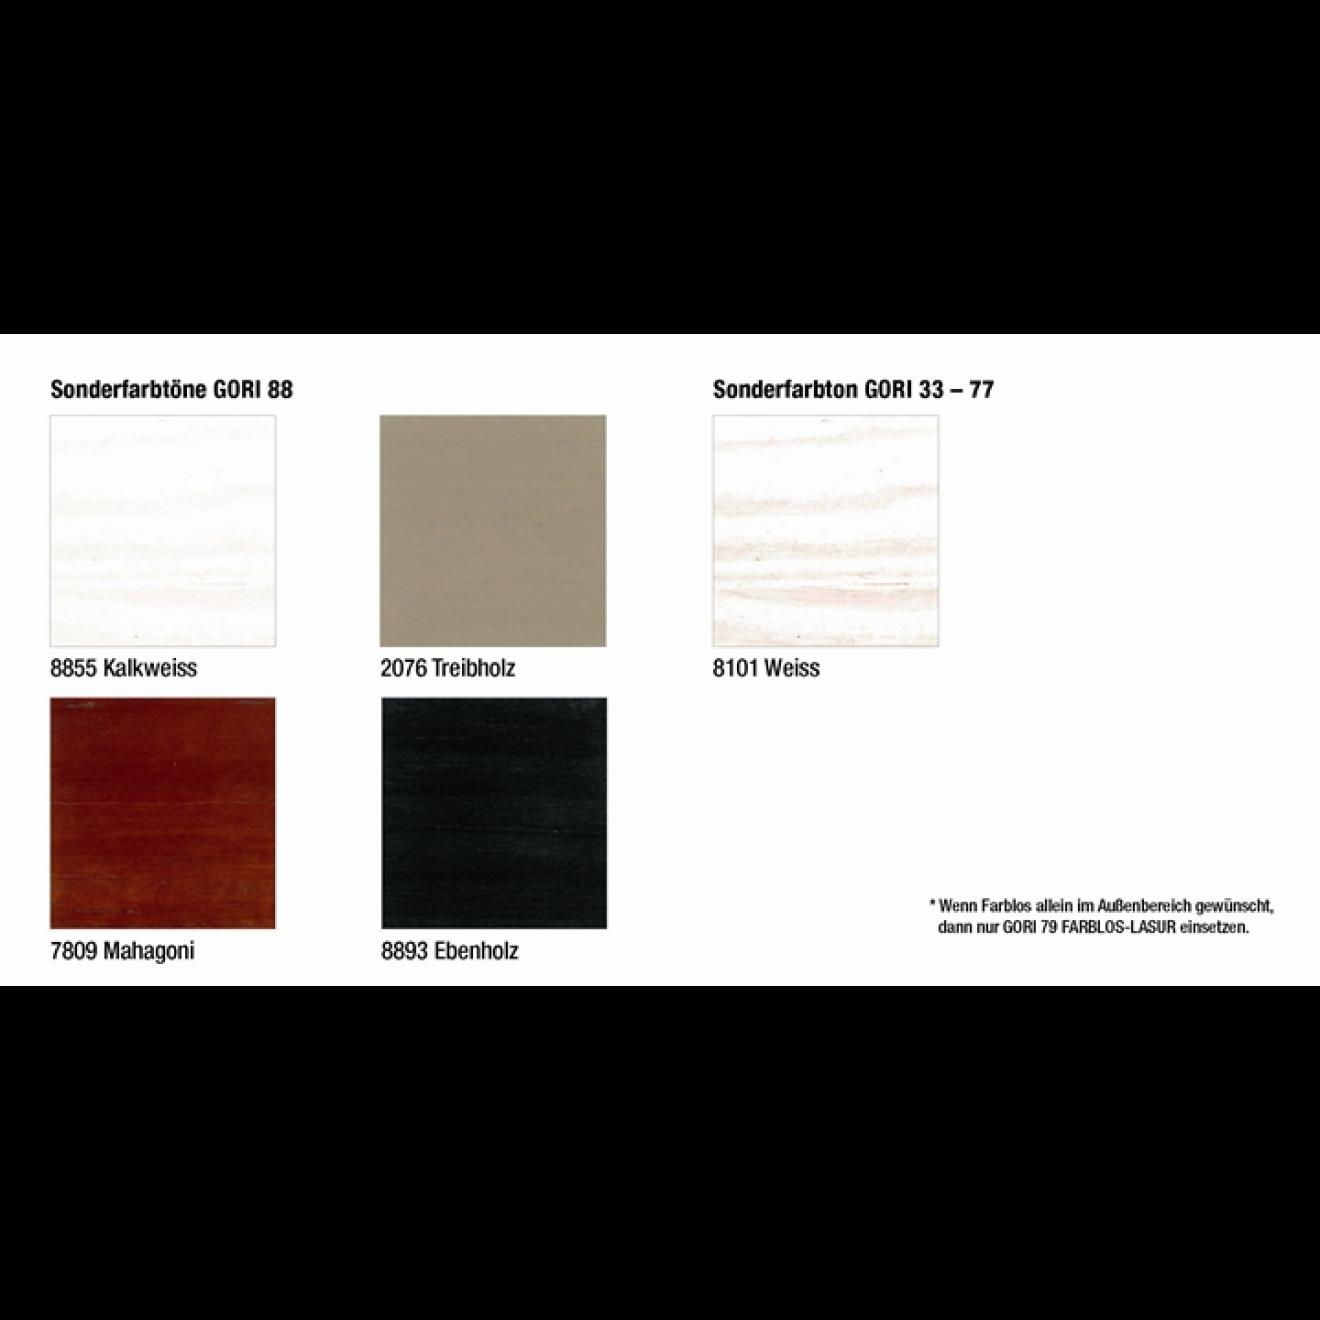 gori 88 compact lasur ab 17 95 im online kaufen. Black Bedroom Furniture Sets. Home Design Ideas